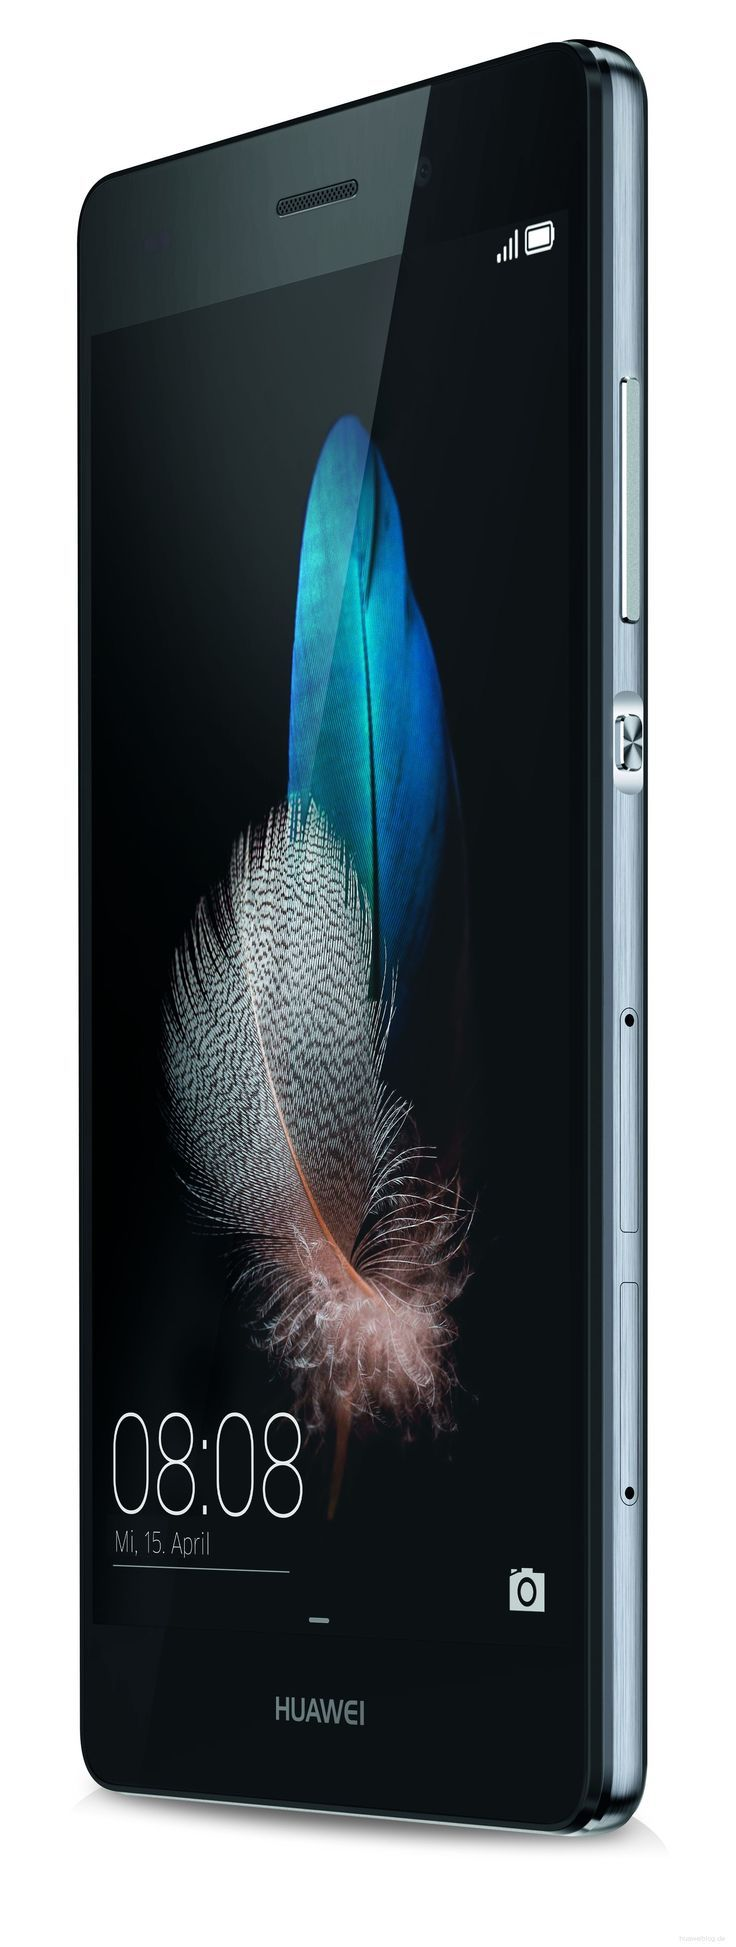 Huawei P8 Lite in Kürze erhältlich #tecnologia #huawei #blogtecnologia #tablet #bq #edison #tabletoferta #tabletbarata